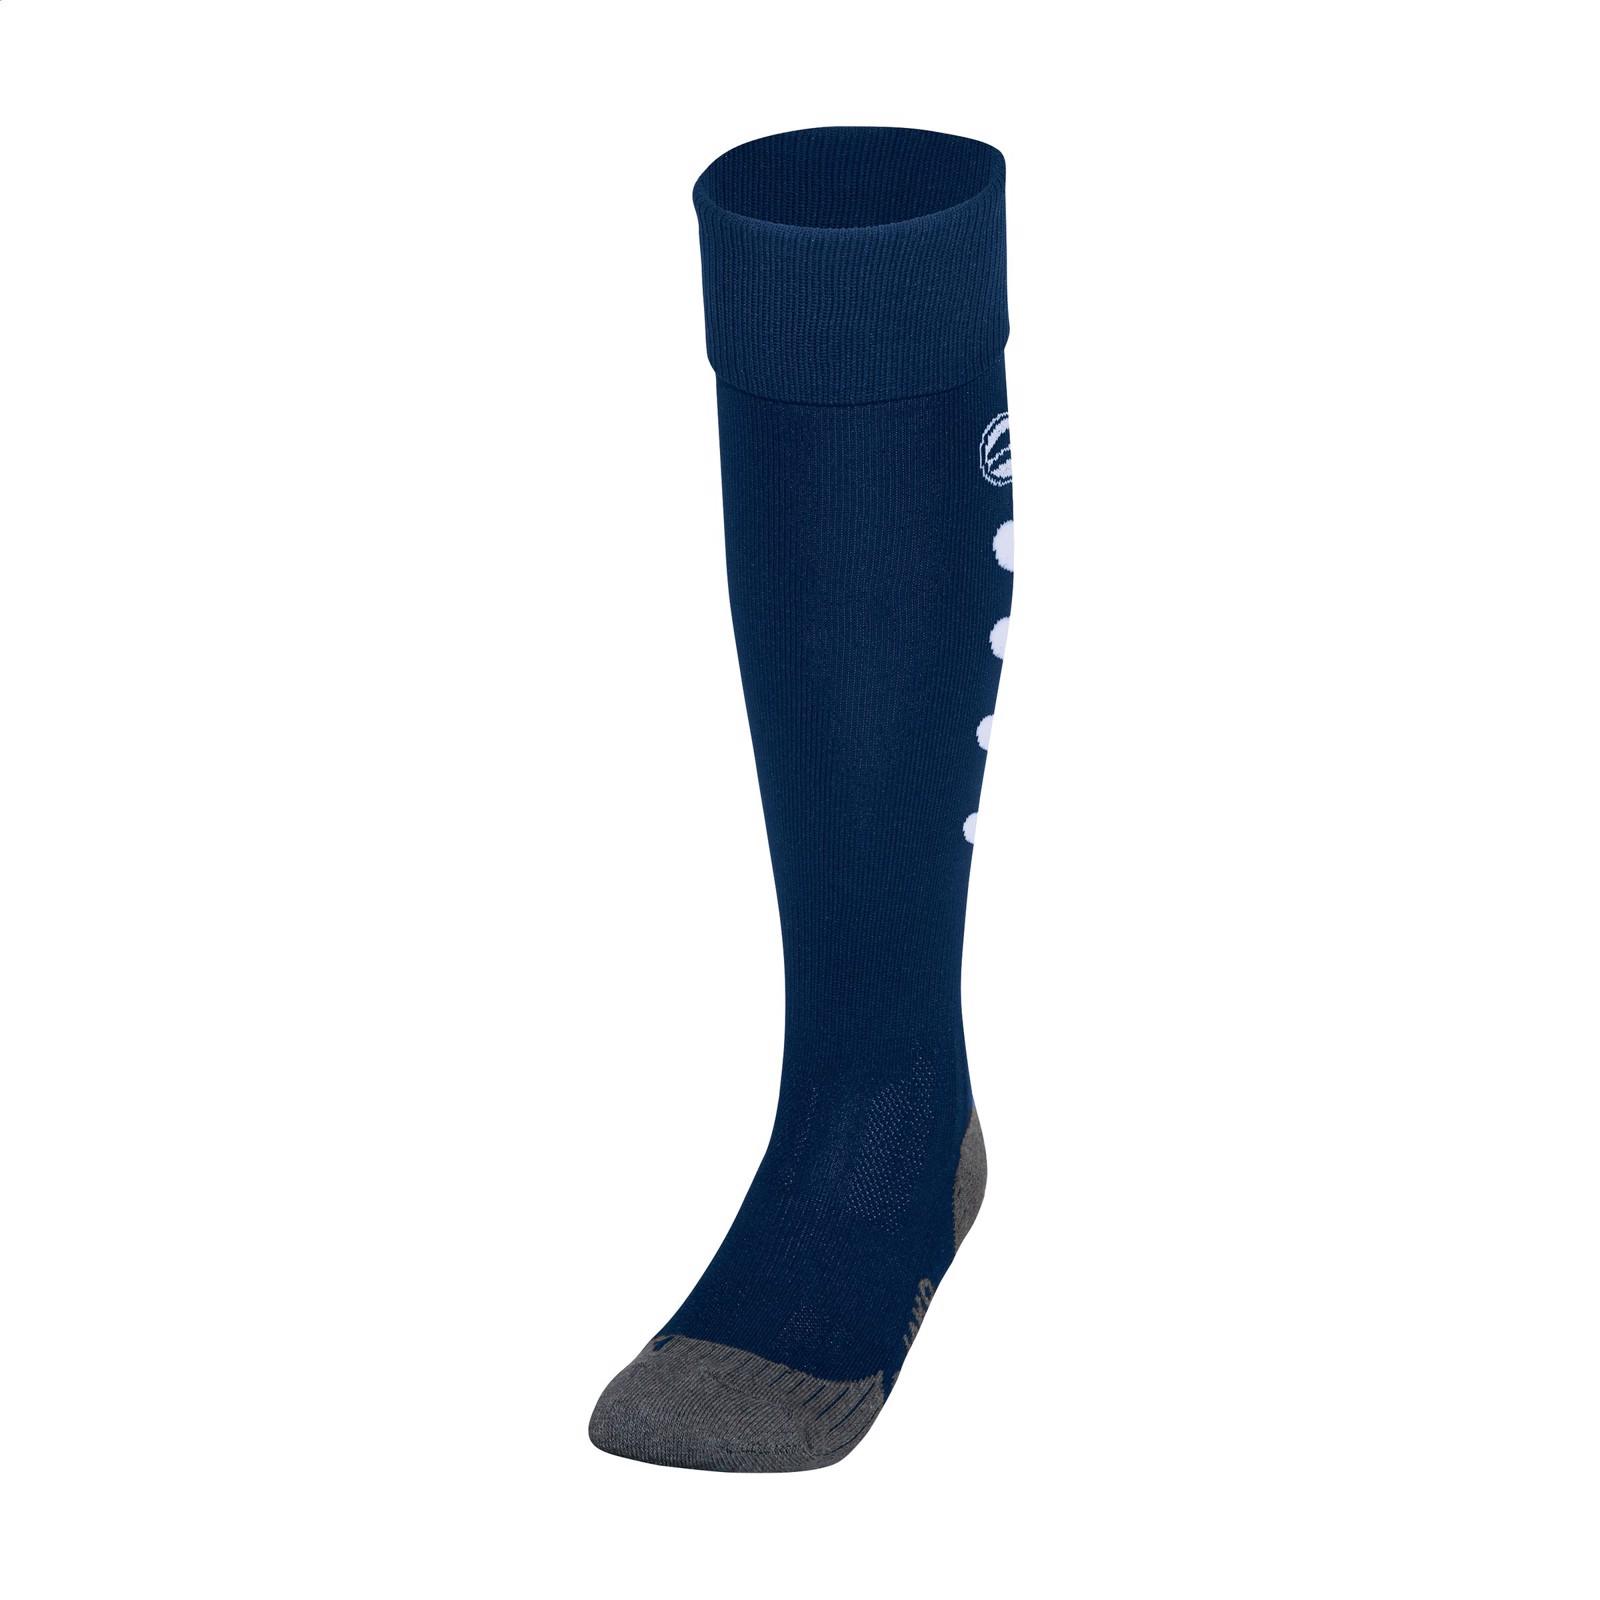 Jako® Roma Sport Socks - Navy / M